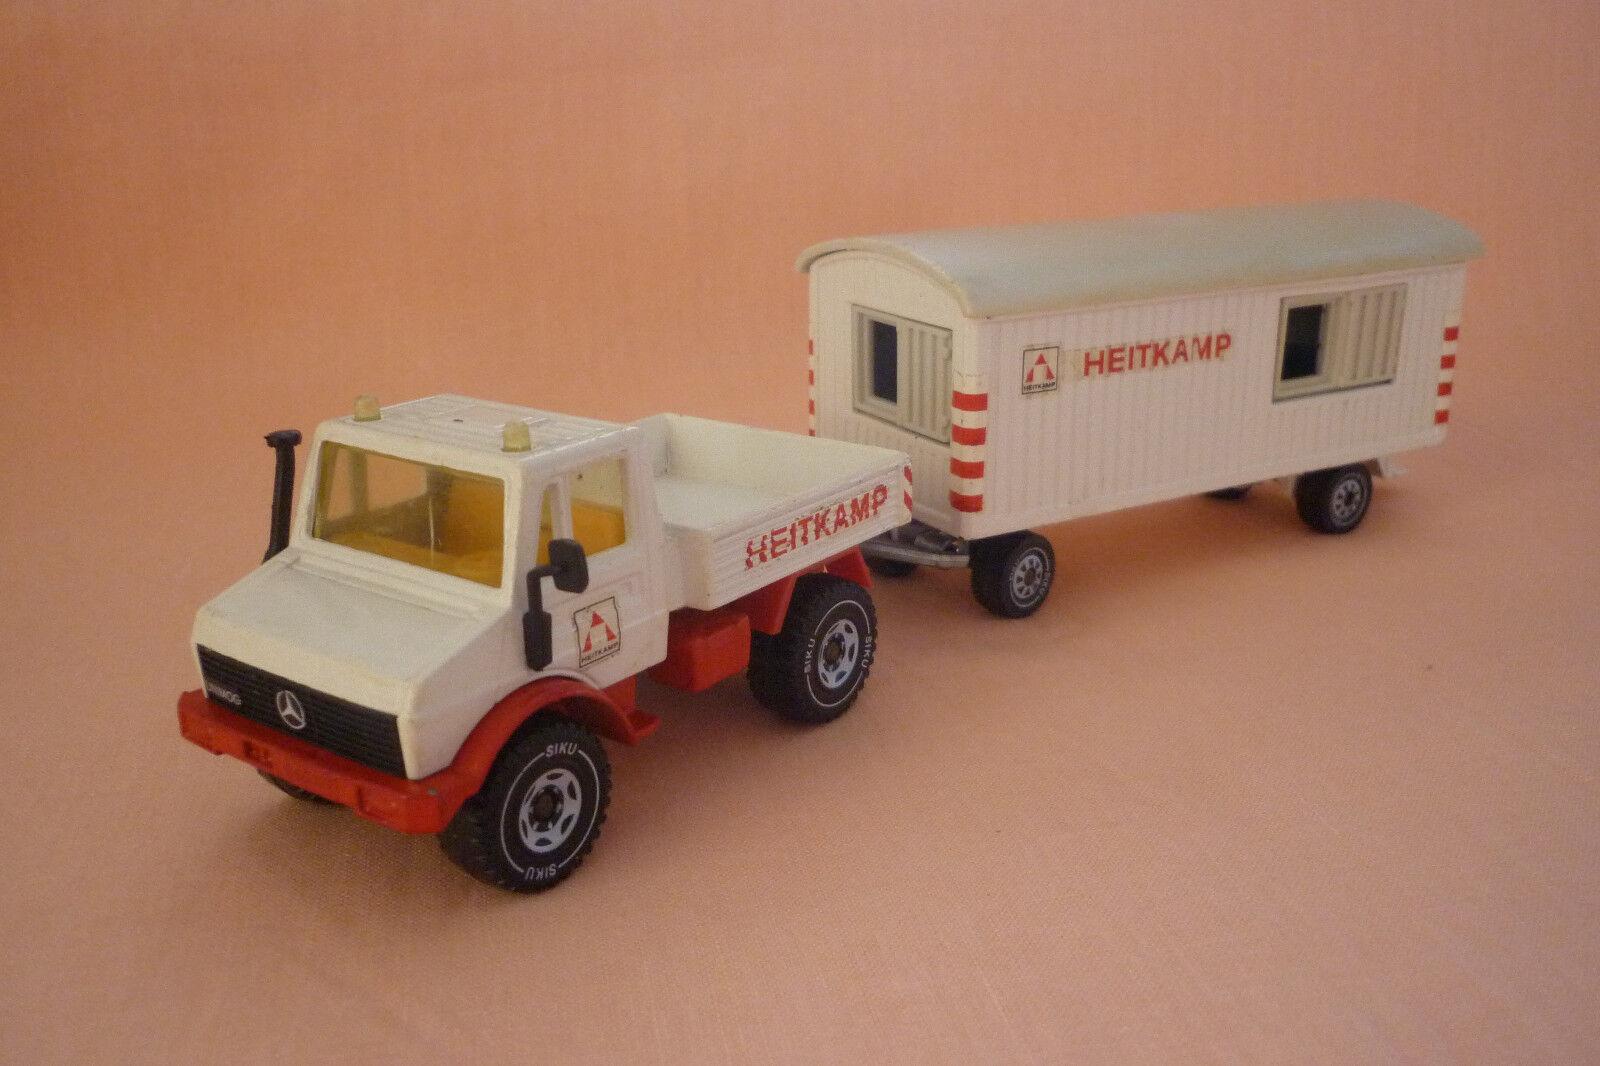 SIKU  modèle-UNIMOG U 1500 avec chantier Heitkamp Set - 2519 - (7.si-35)